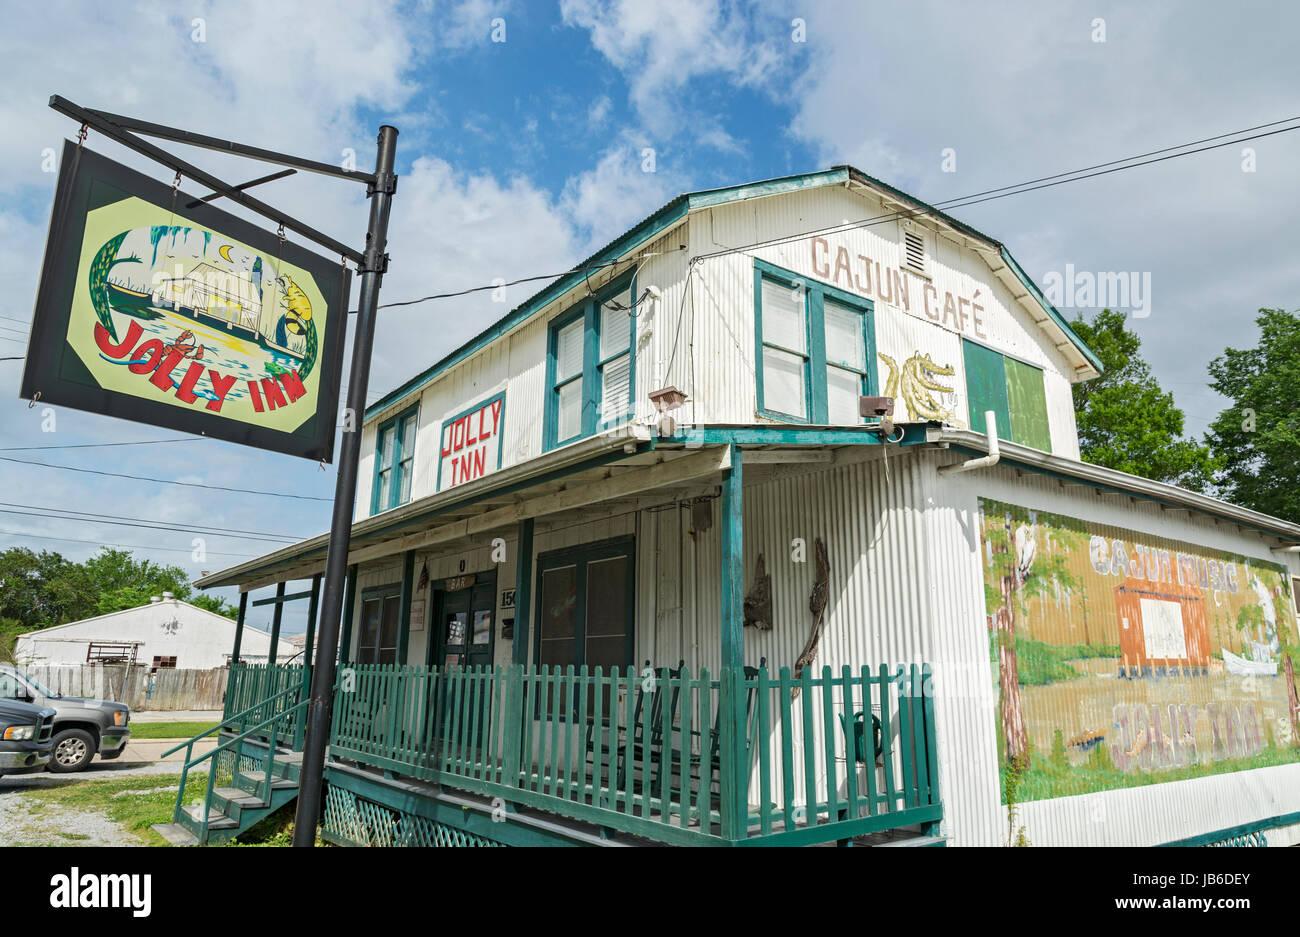 Louisiana, Houma, Jolly Inn, Cajun Cafe, bar, restaurant, Cajun music venue - Stock Image